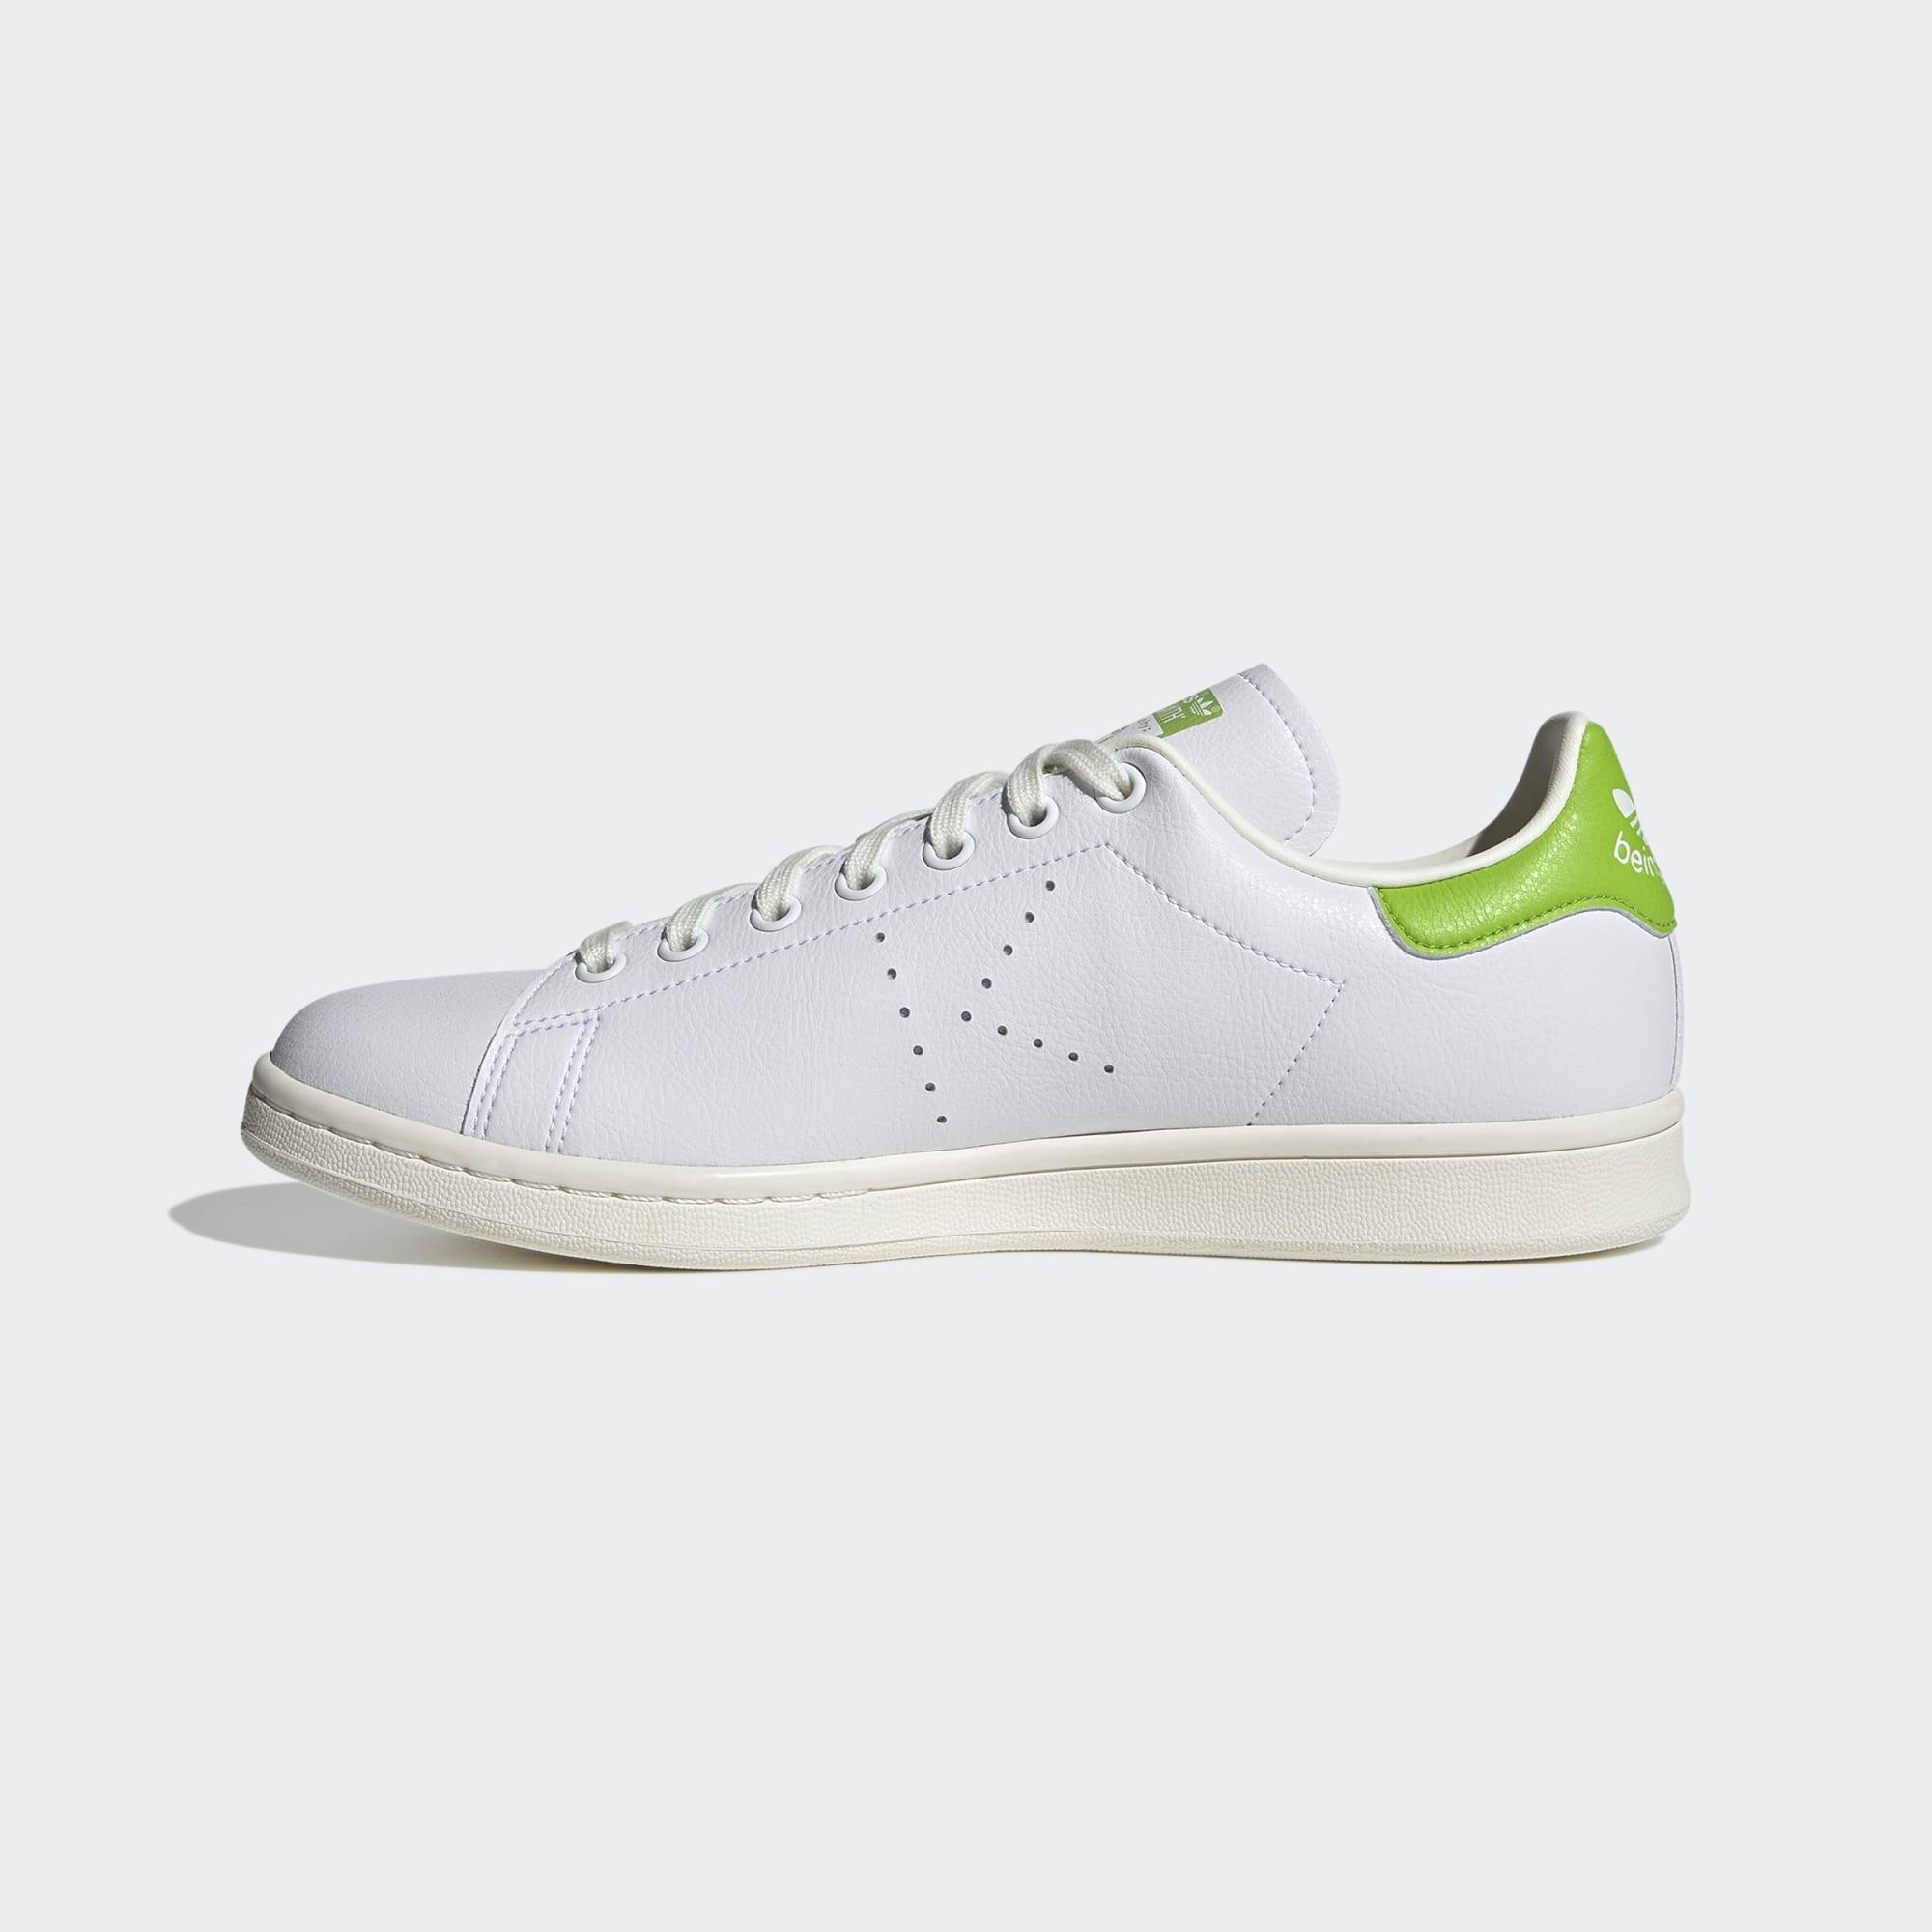 Stan_Smith_Shoes_Vit_FY5460_06_standard.jpg